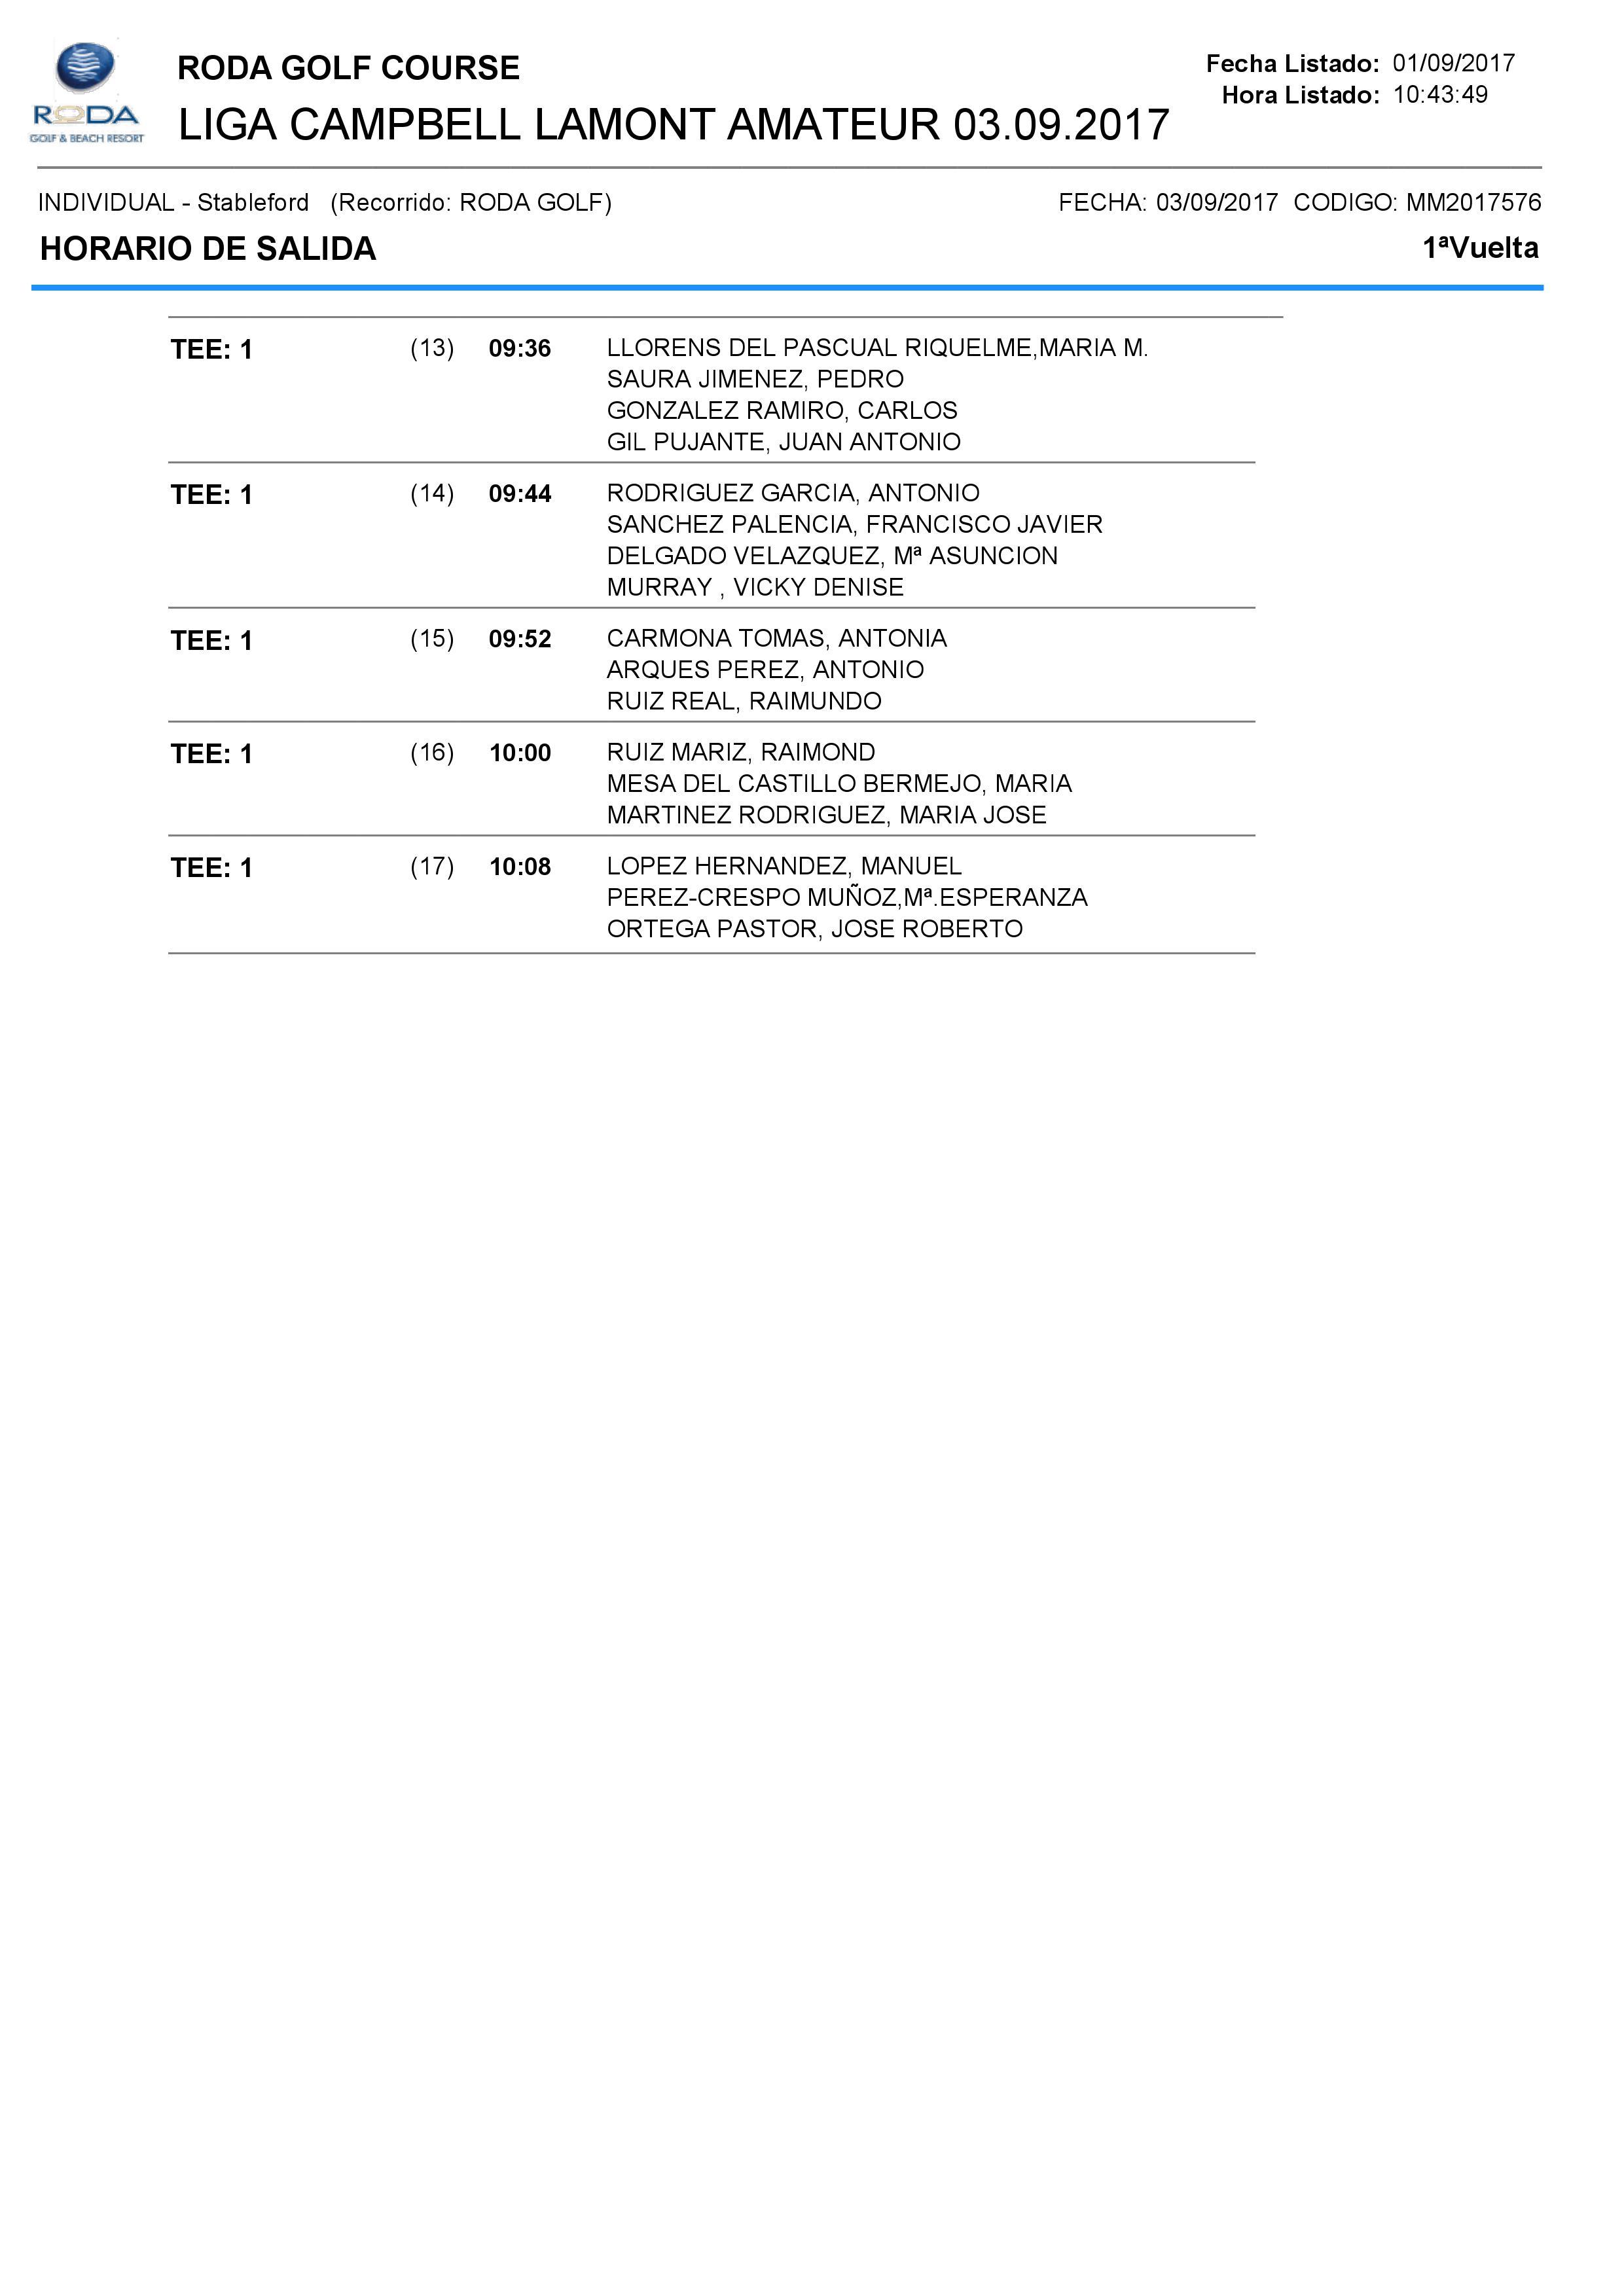 170903 ROD, Horario de salidas (2)